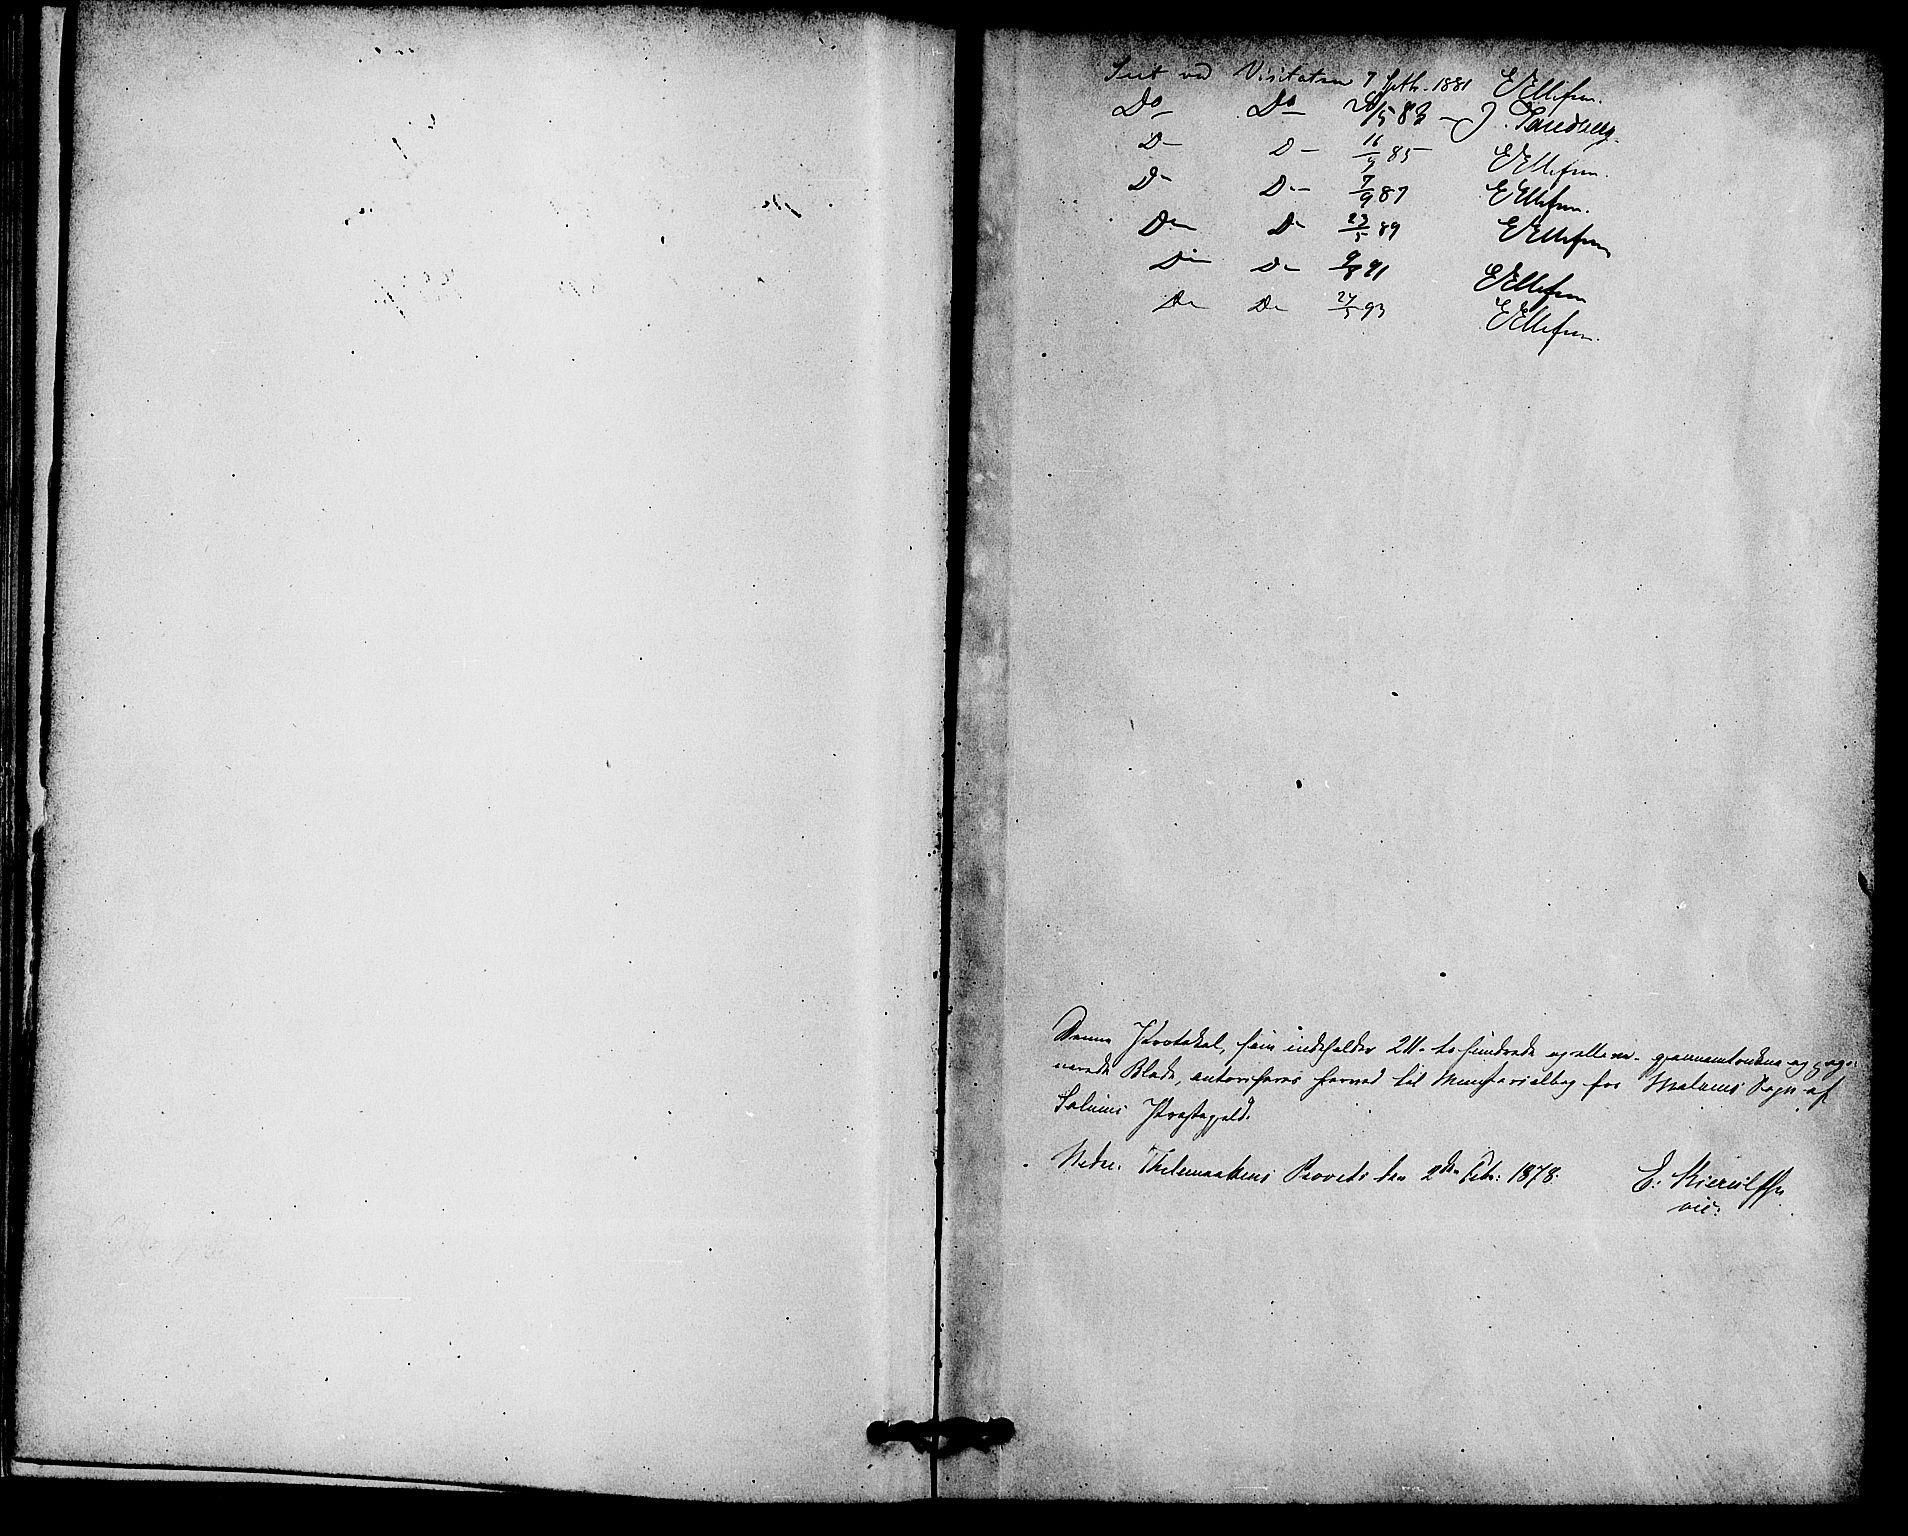 SAKO, Solum kirkebøker, F/Fb/L0001: Ministerialbok nr. II 1, 1877-1892